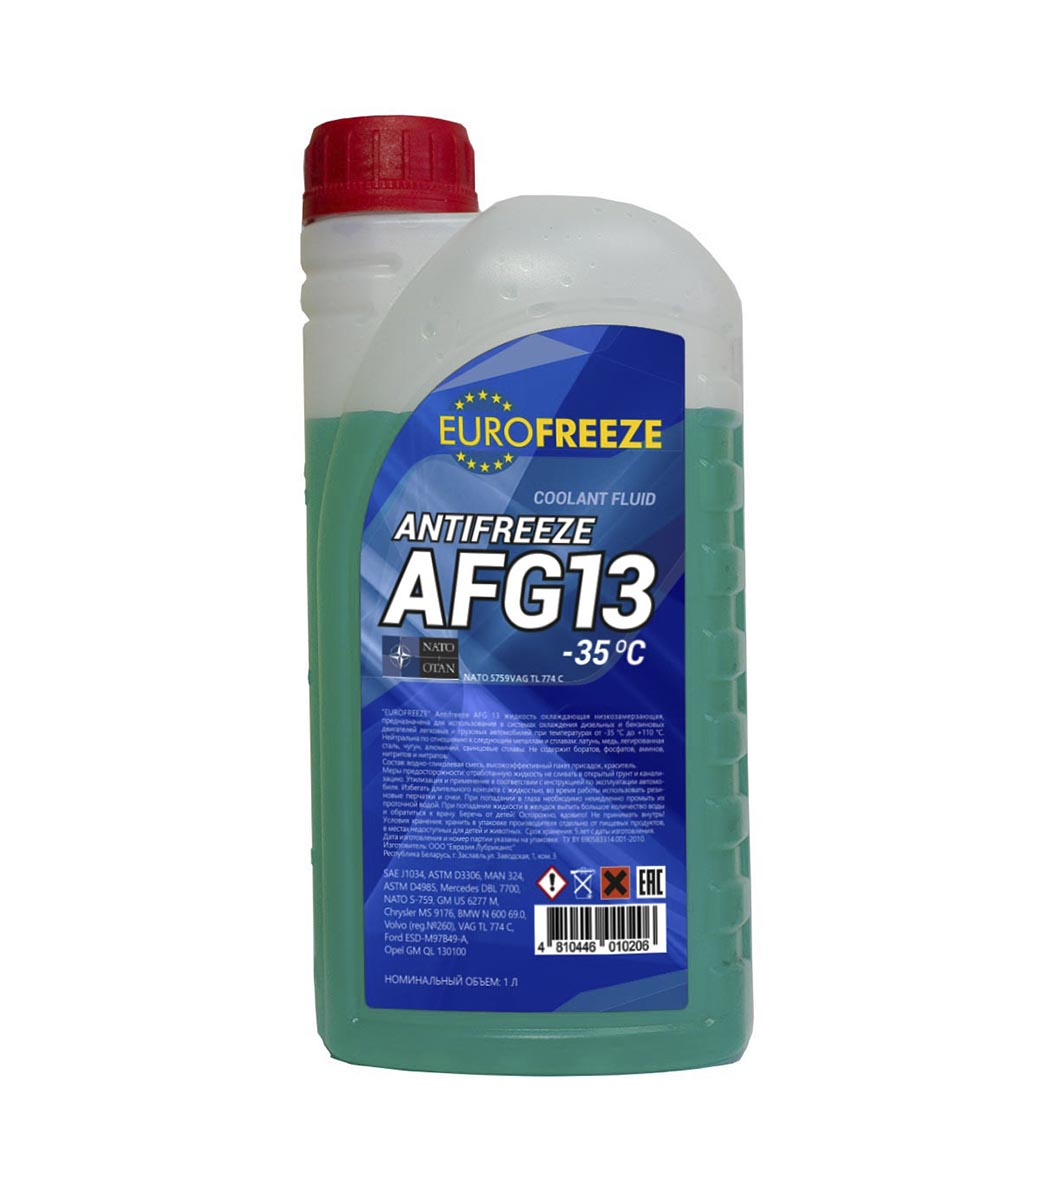 Eurofreeze Antifreeze AFG 13